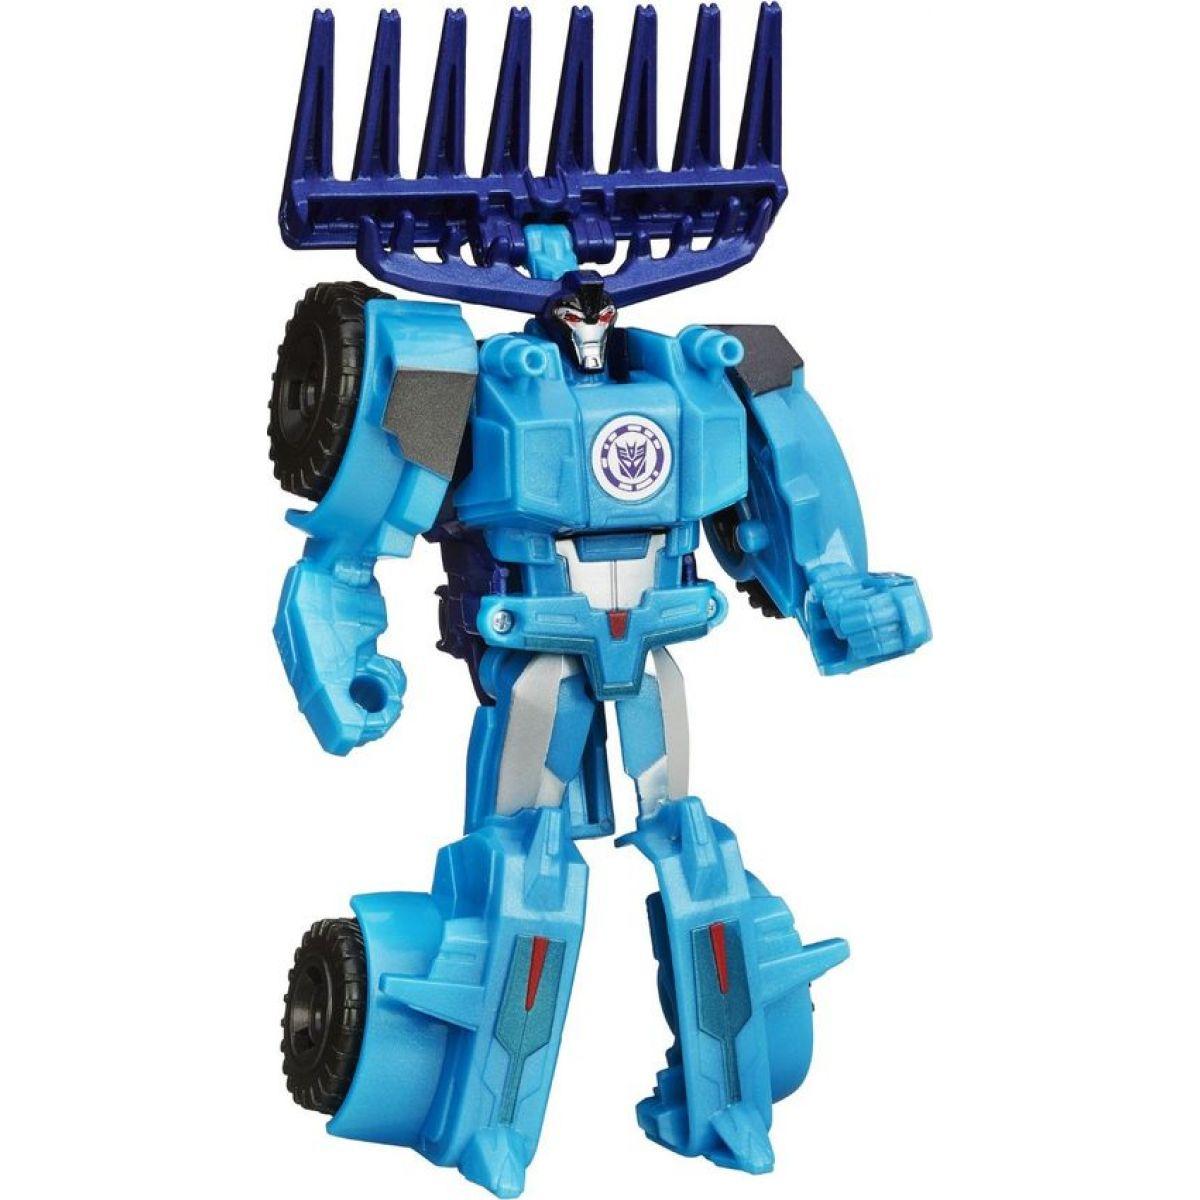 Hasbro Transformers RID Transformace v 1 kroku - Thunderhoof